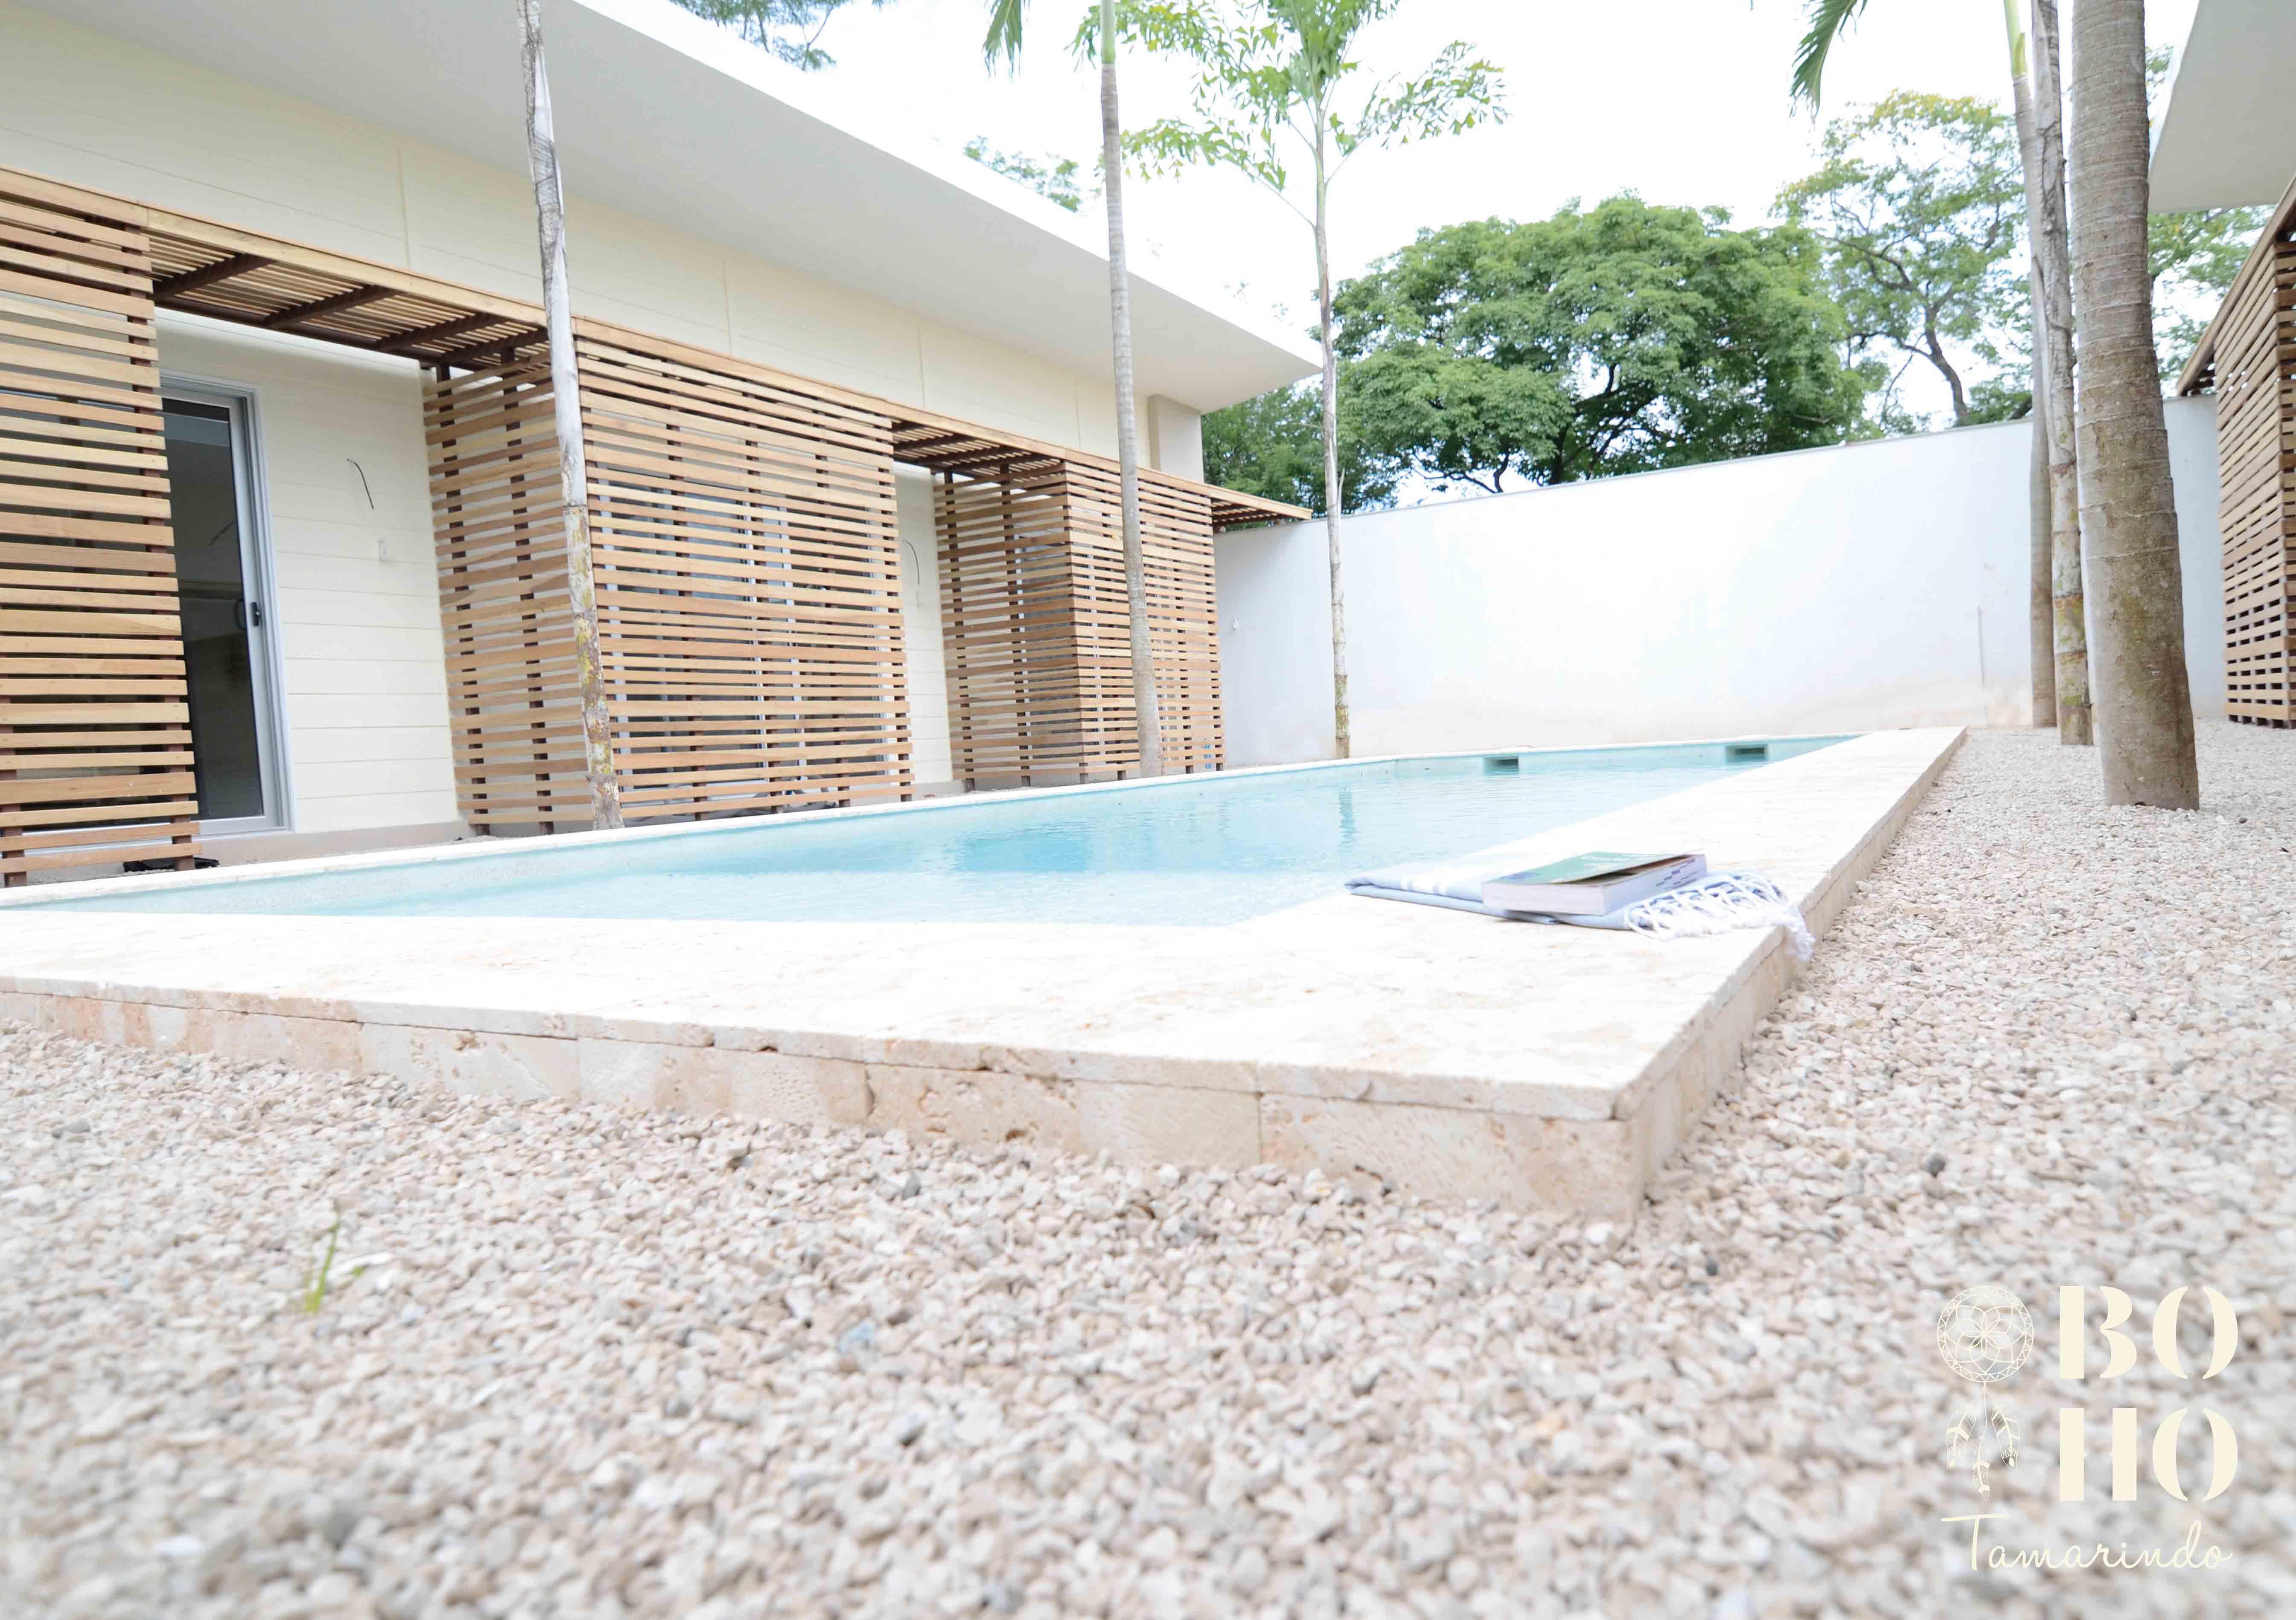 BoHo Pool in Tamarindo Costa Rica